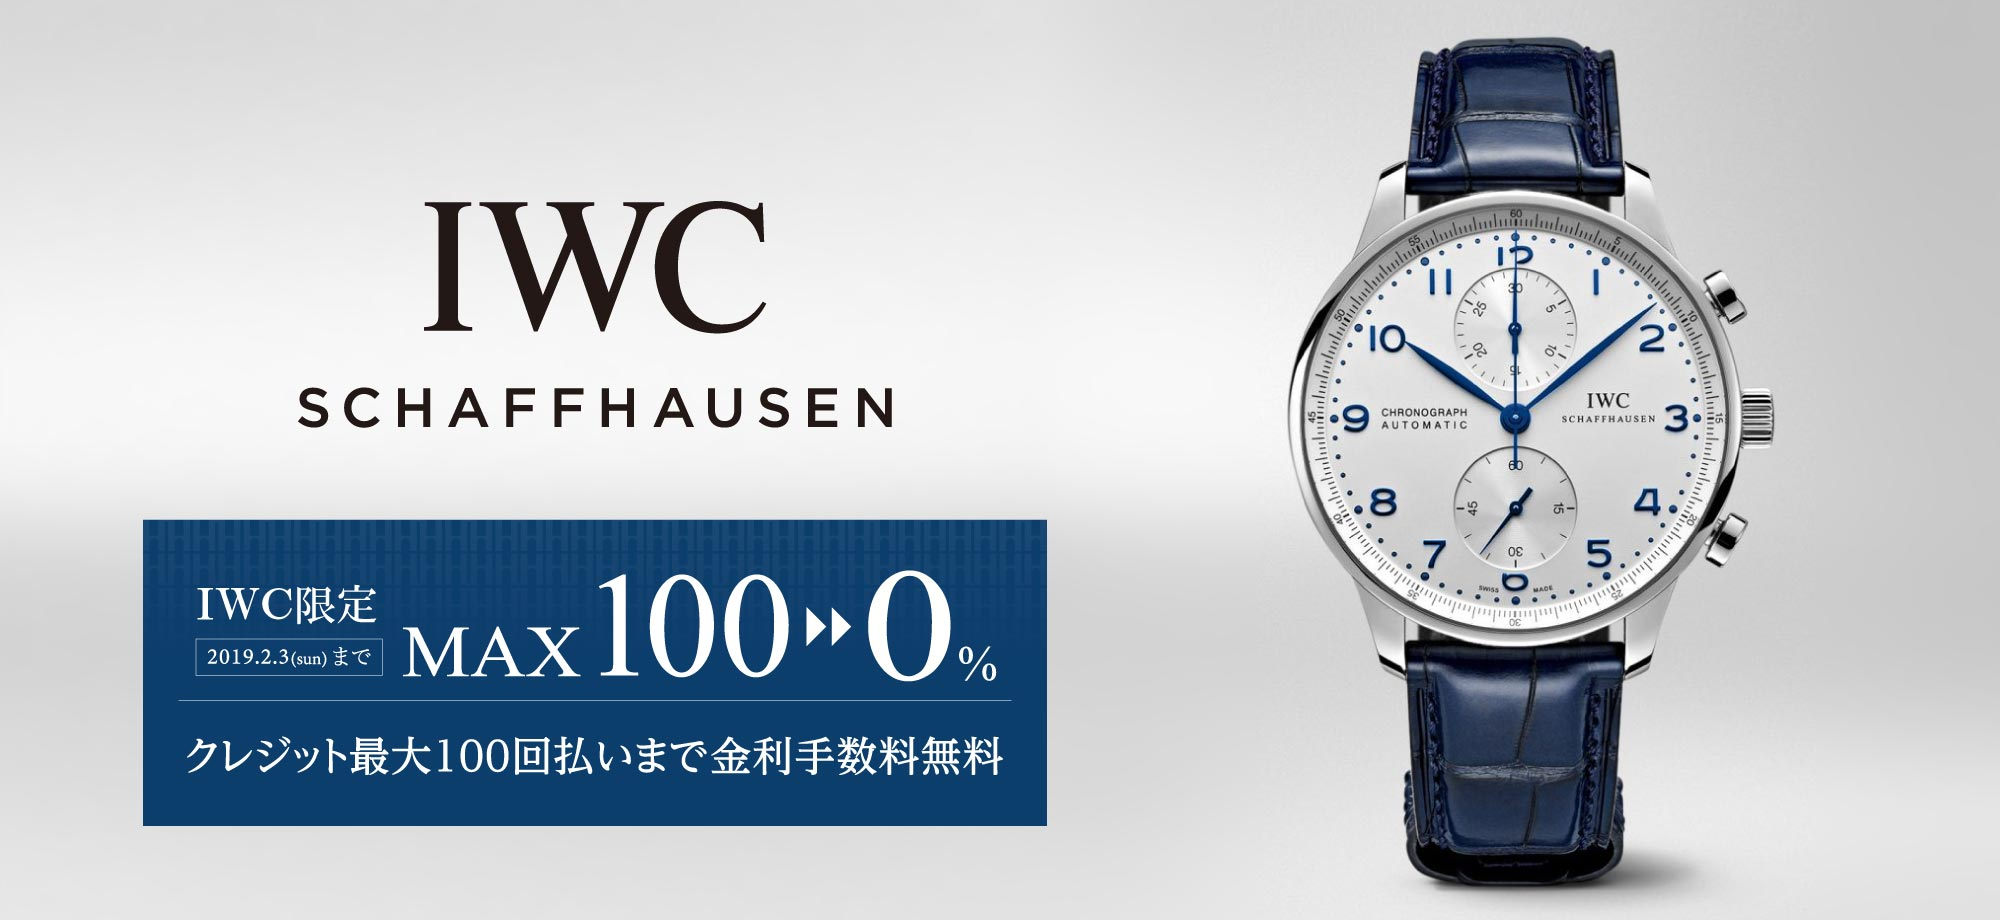 IWC_max100_201901_2000_920